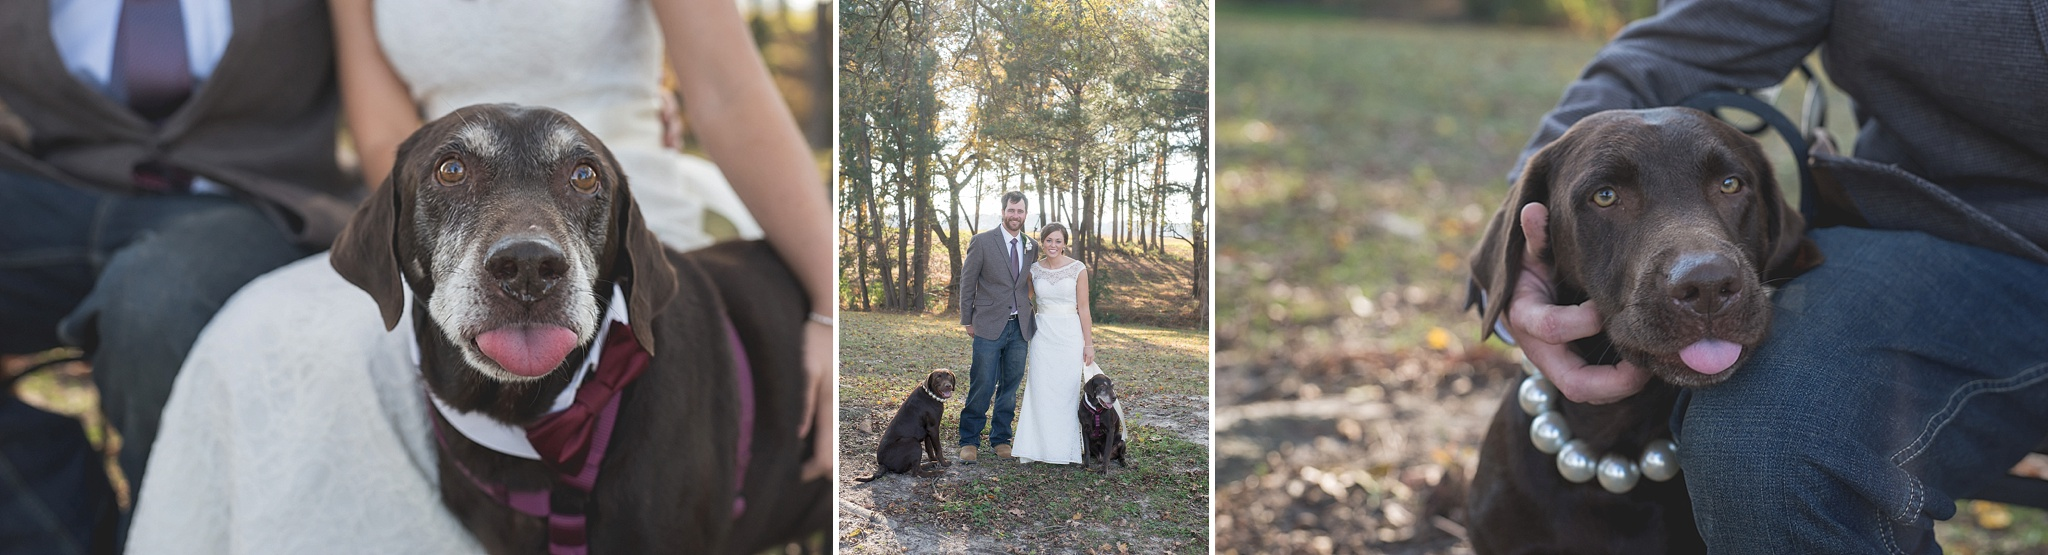 May-Lew-Farm-Farmville-NC-Wedding-Photographer-081.jpg